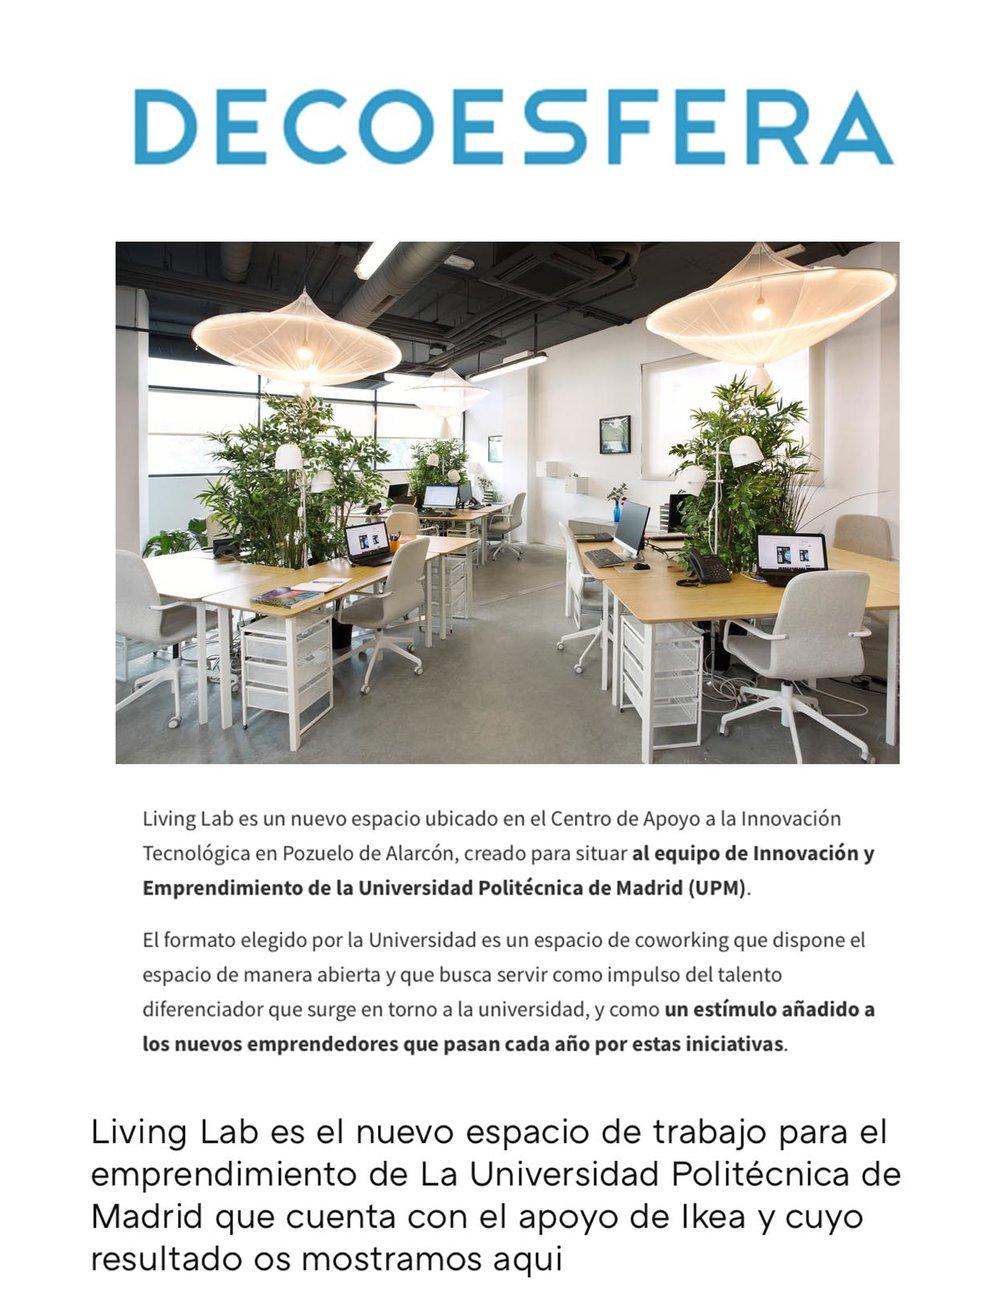 emmme studio decoesfera reformas diseño slow prensa living lab upm.jpg